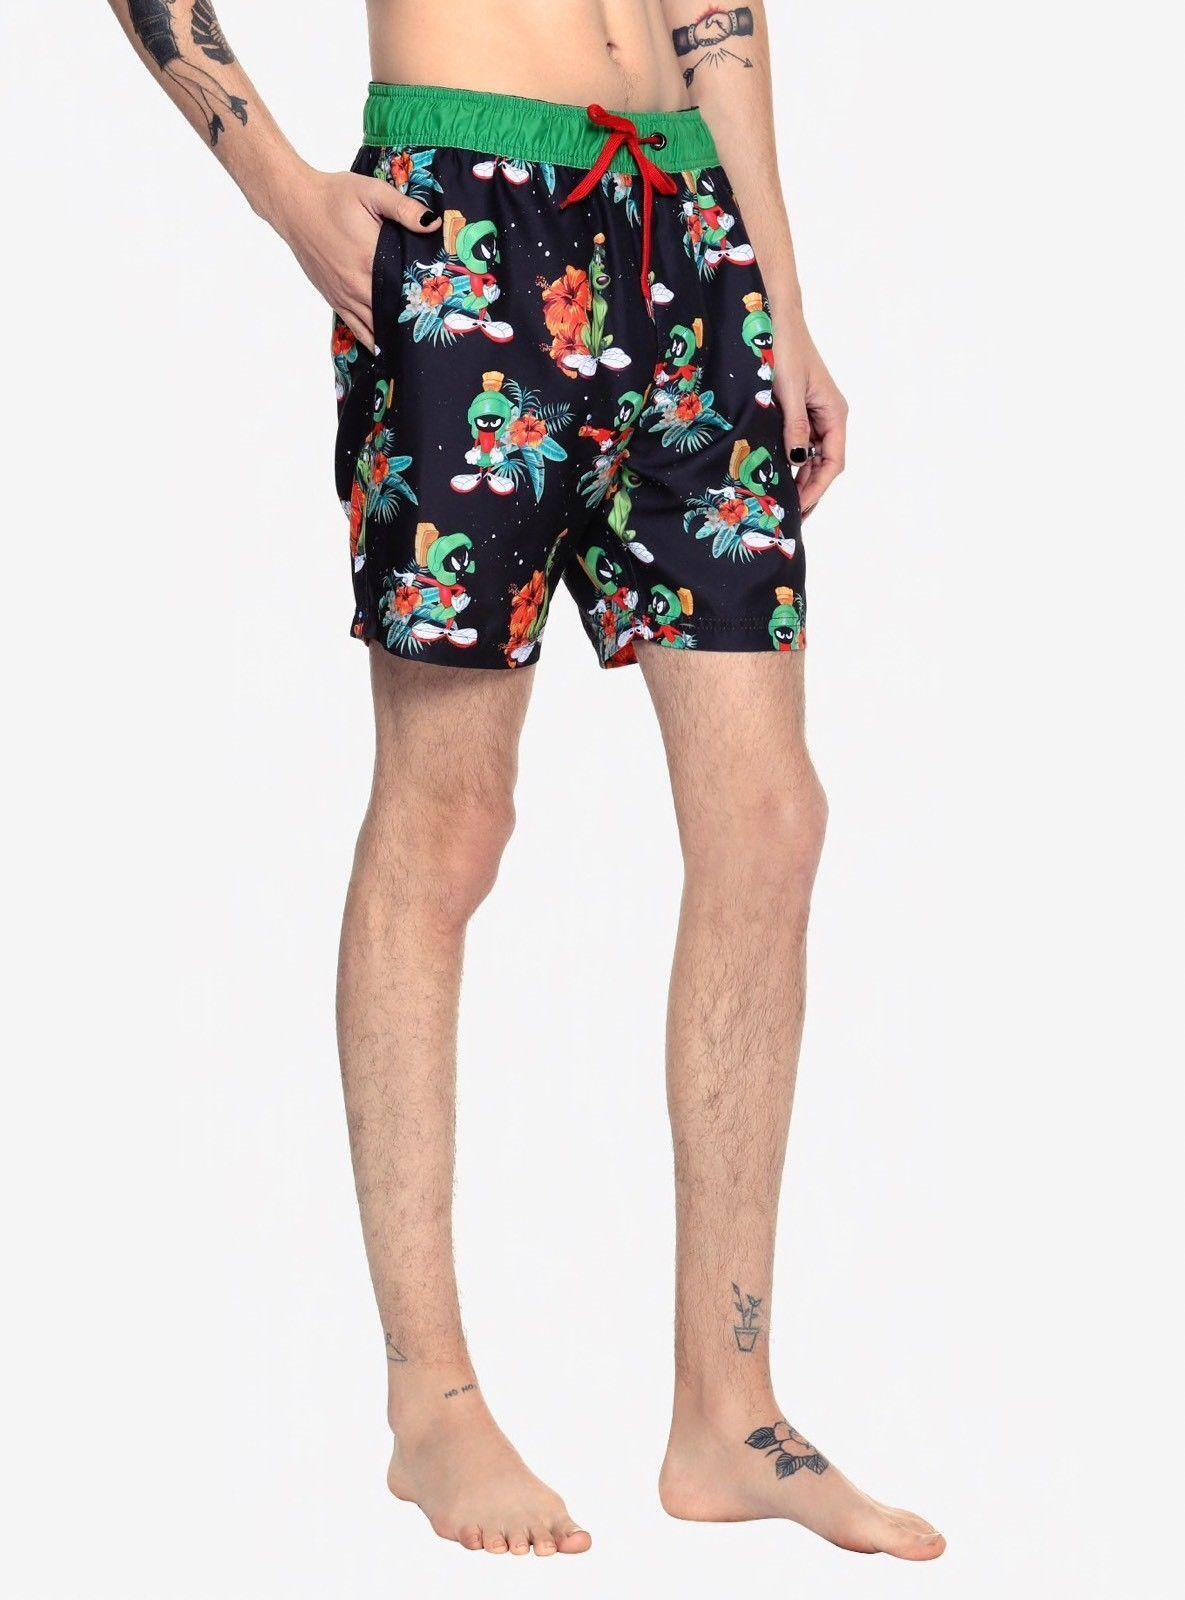 Looney Tunes Marvin The Martian Swim Trunks  Swim Suit Boardshorts 40 NWT